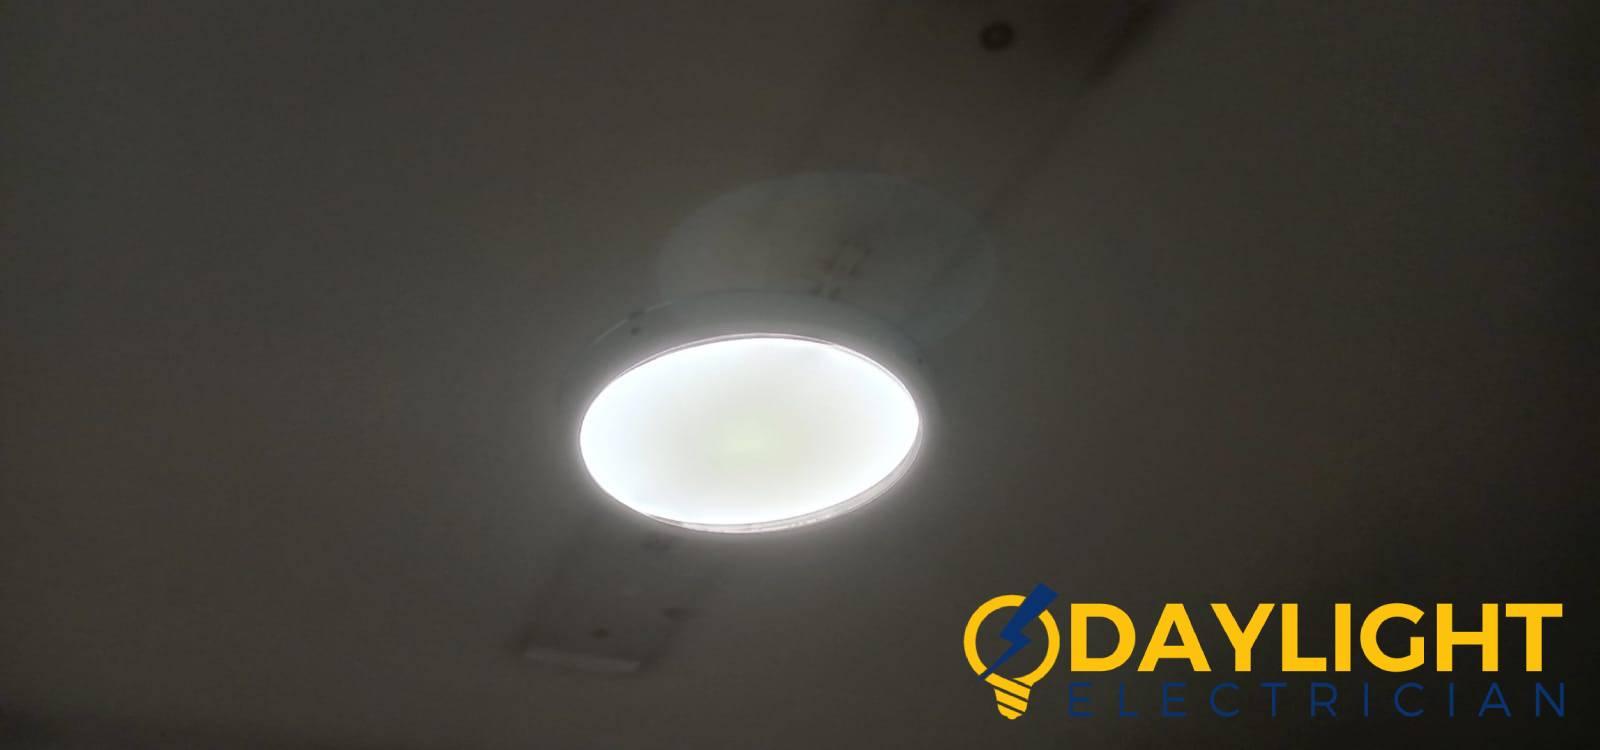 driver-replacement-light-repair-services-electrician-singapore-hdb-punggol-field-2